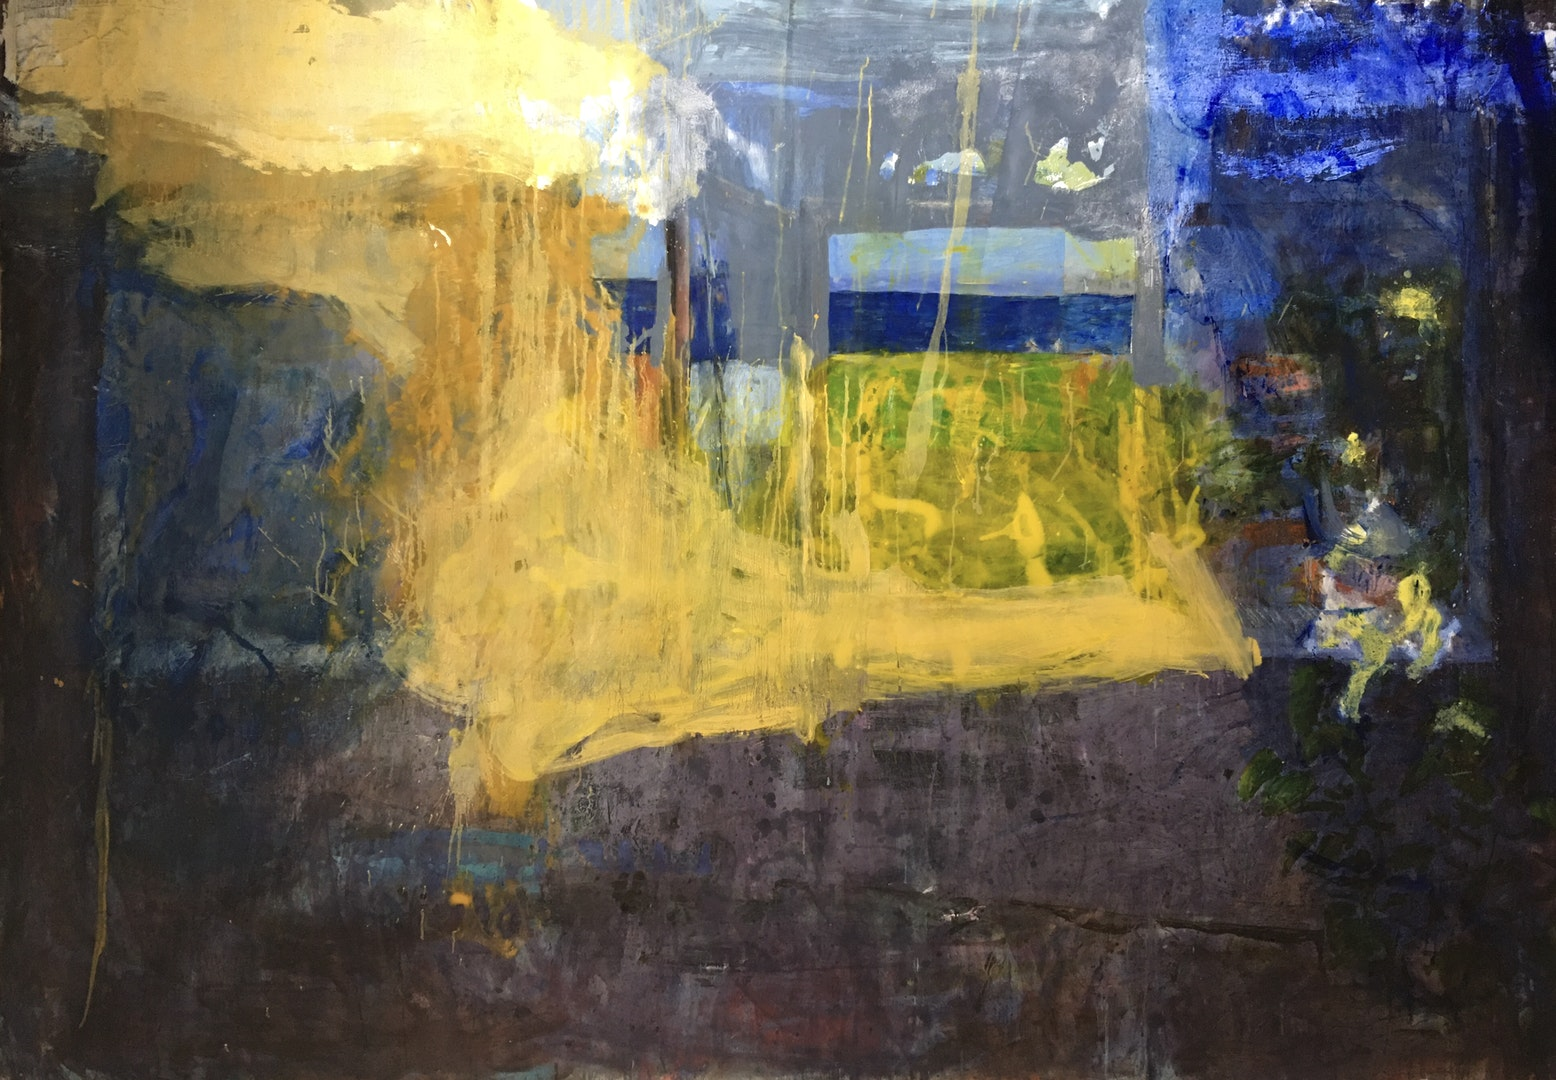 'Serendipity', Luis Lopez del castillo, Oil on canvas, 162 x 283 cm